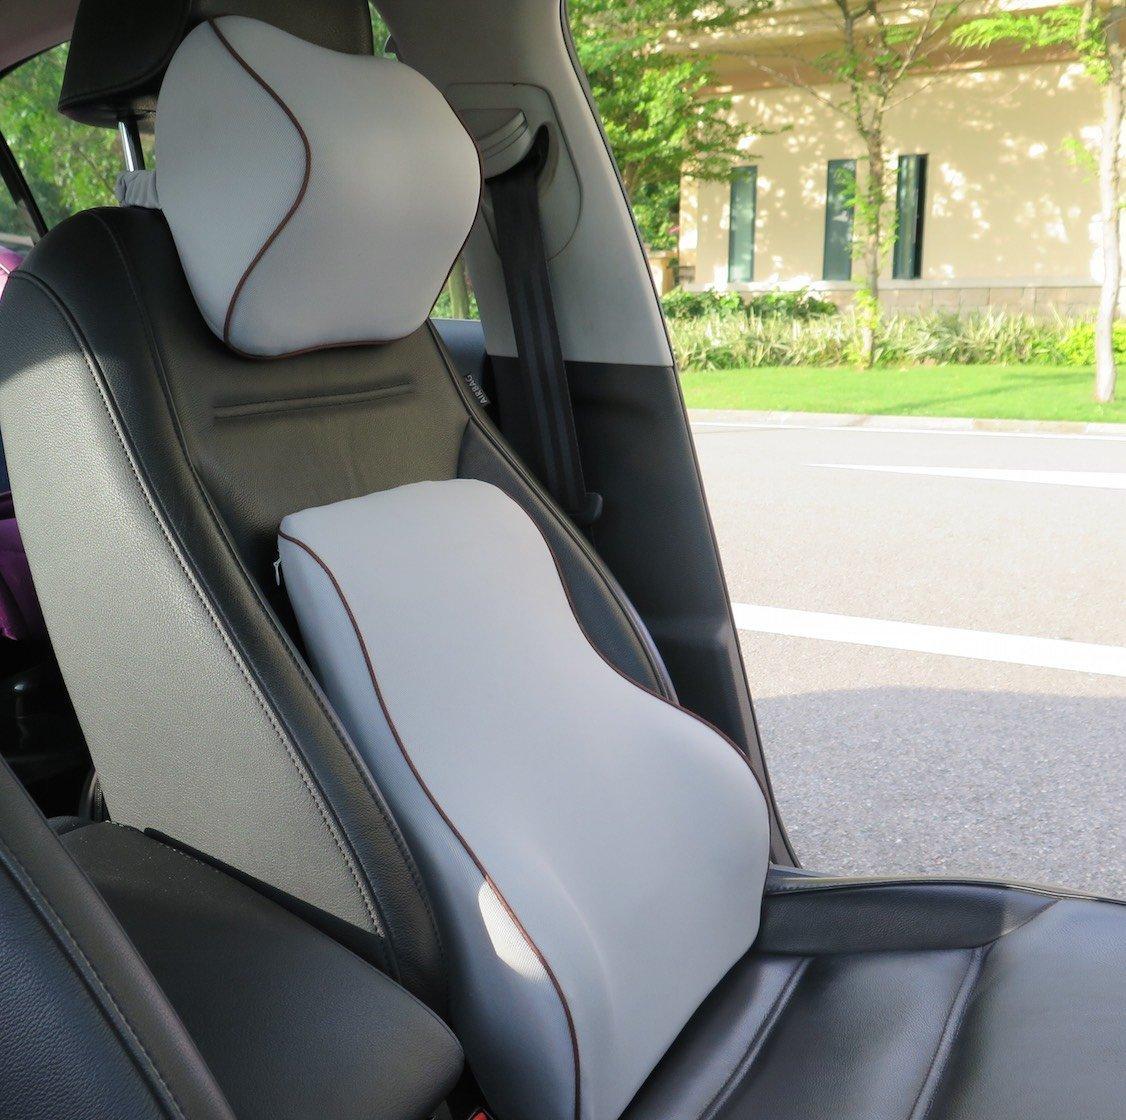 car comfort best lumbar support for car seats. Black Bedroom Furniture Sets. Home Design Ideas